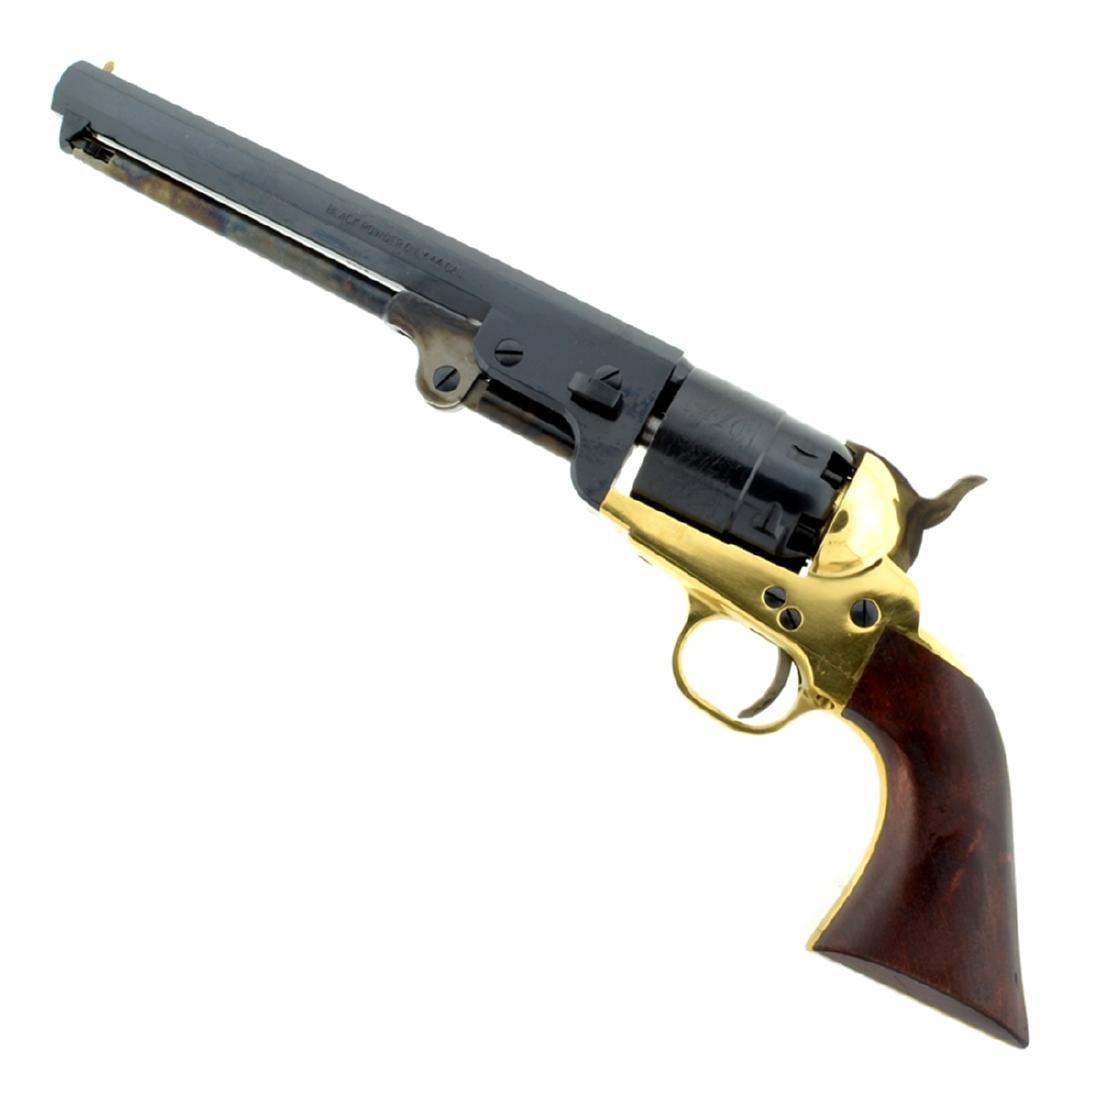 Gun Exquisite New, Original Box, Papers, Traditions